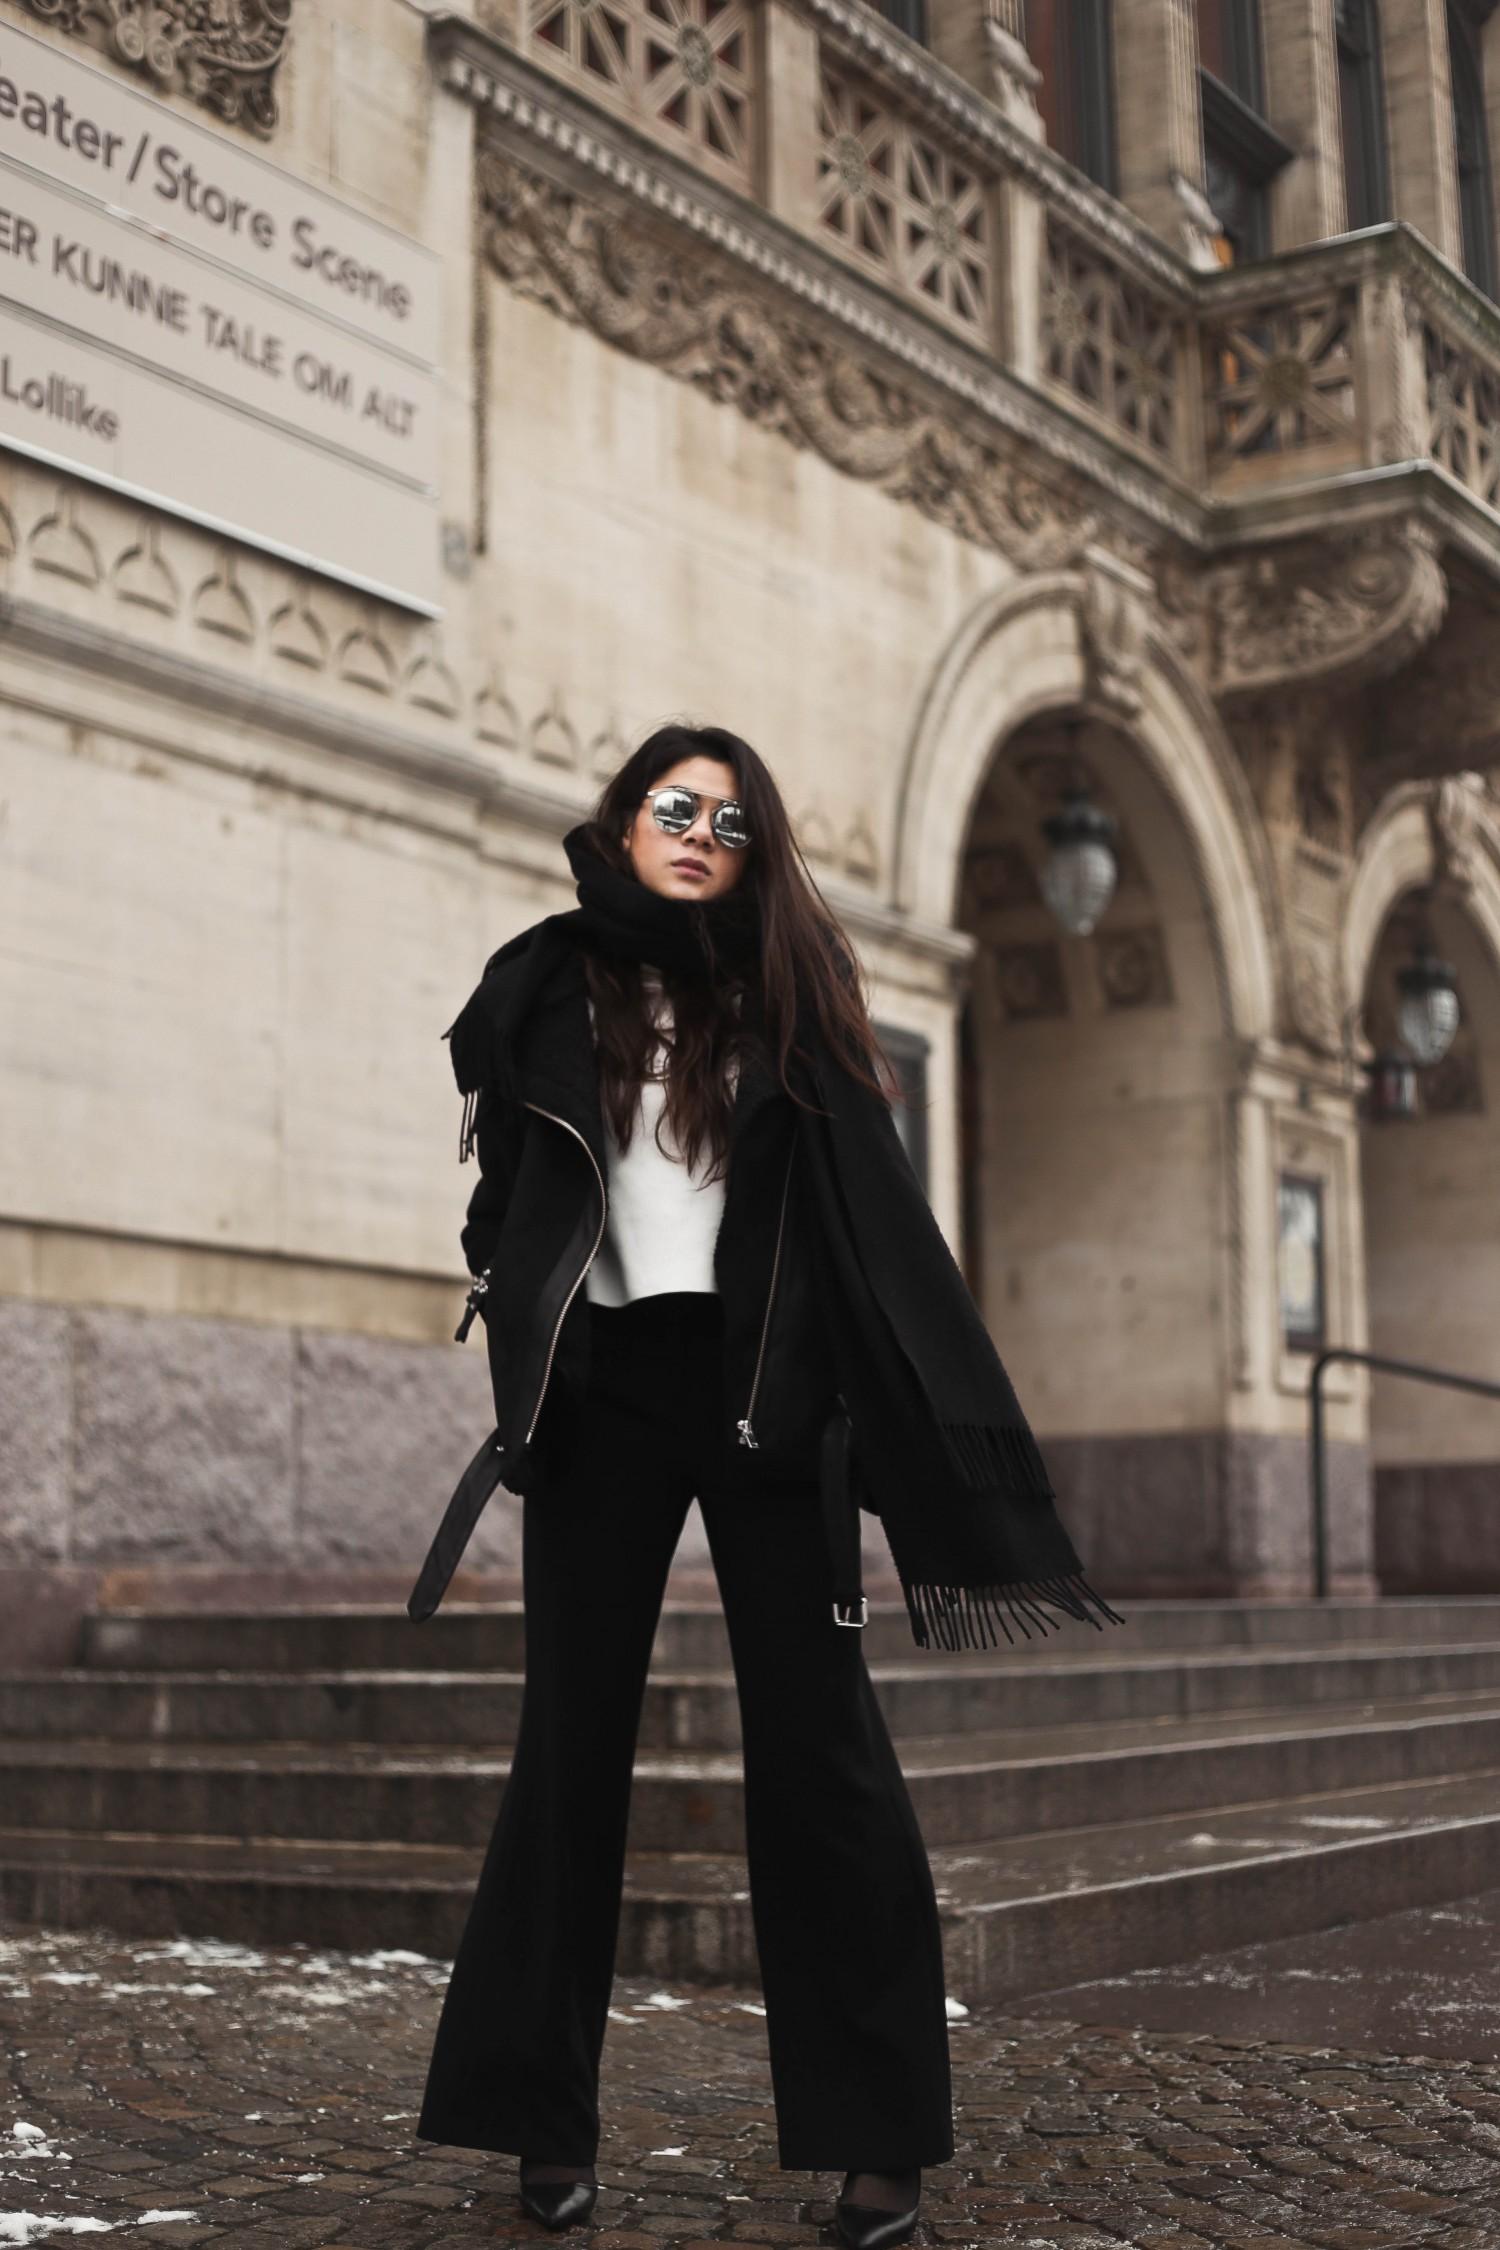 shearling coat-20, shearling coat, gina tricot, hoss pants, pumps, zara pumps, pointy heels, shearling coat outfit, shearling coat style, all black outfit, tailored pants, wide pants outfit, mowoblog, mowo blog, celine trio bag outfit, black on black outfit, winter outfit, danish fashion blogger, fashion blogger, blogger, blogger europe, blog, fashion blog, style blog, danish, scandinavian style